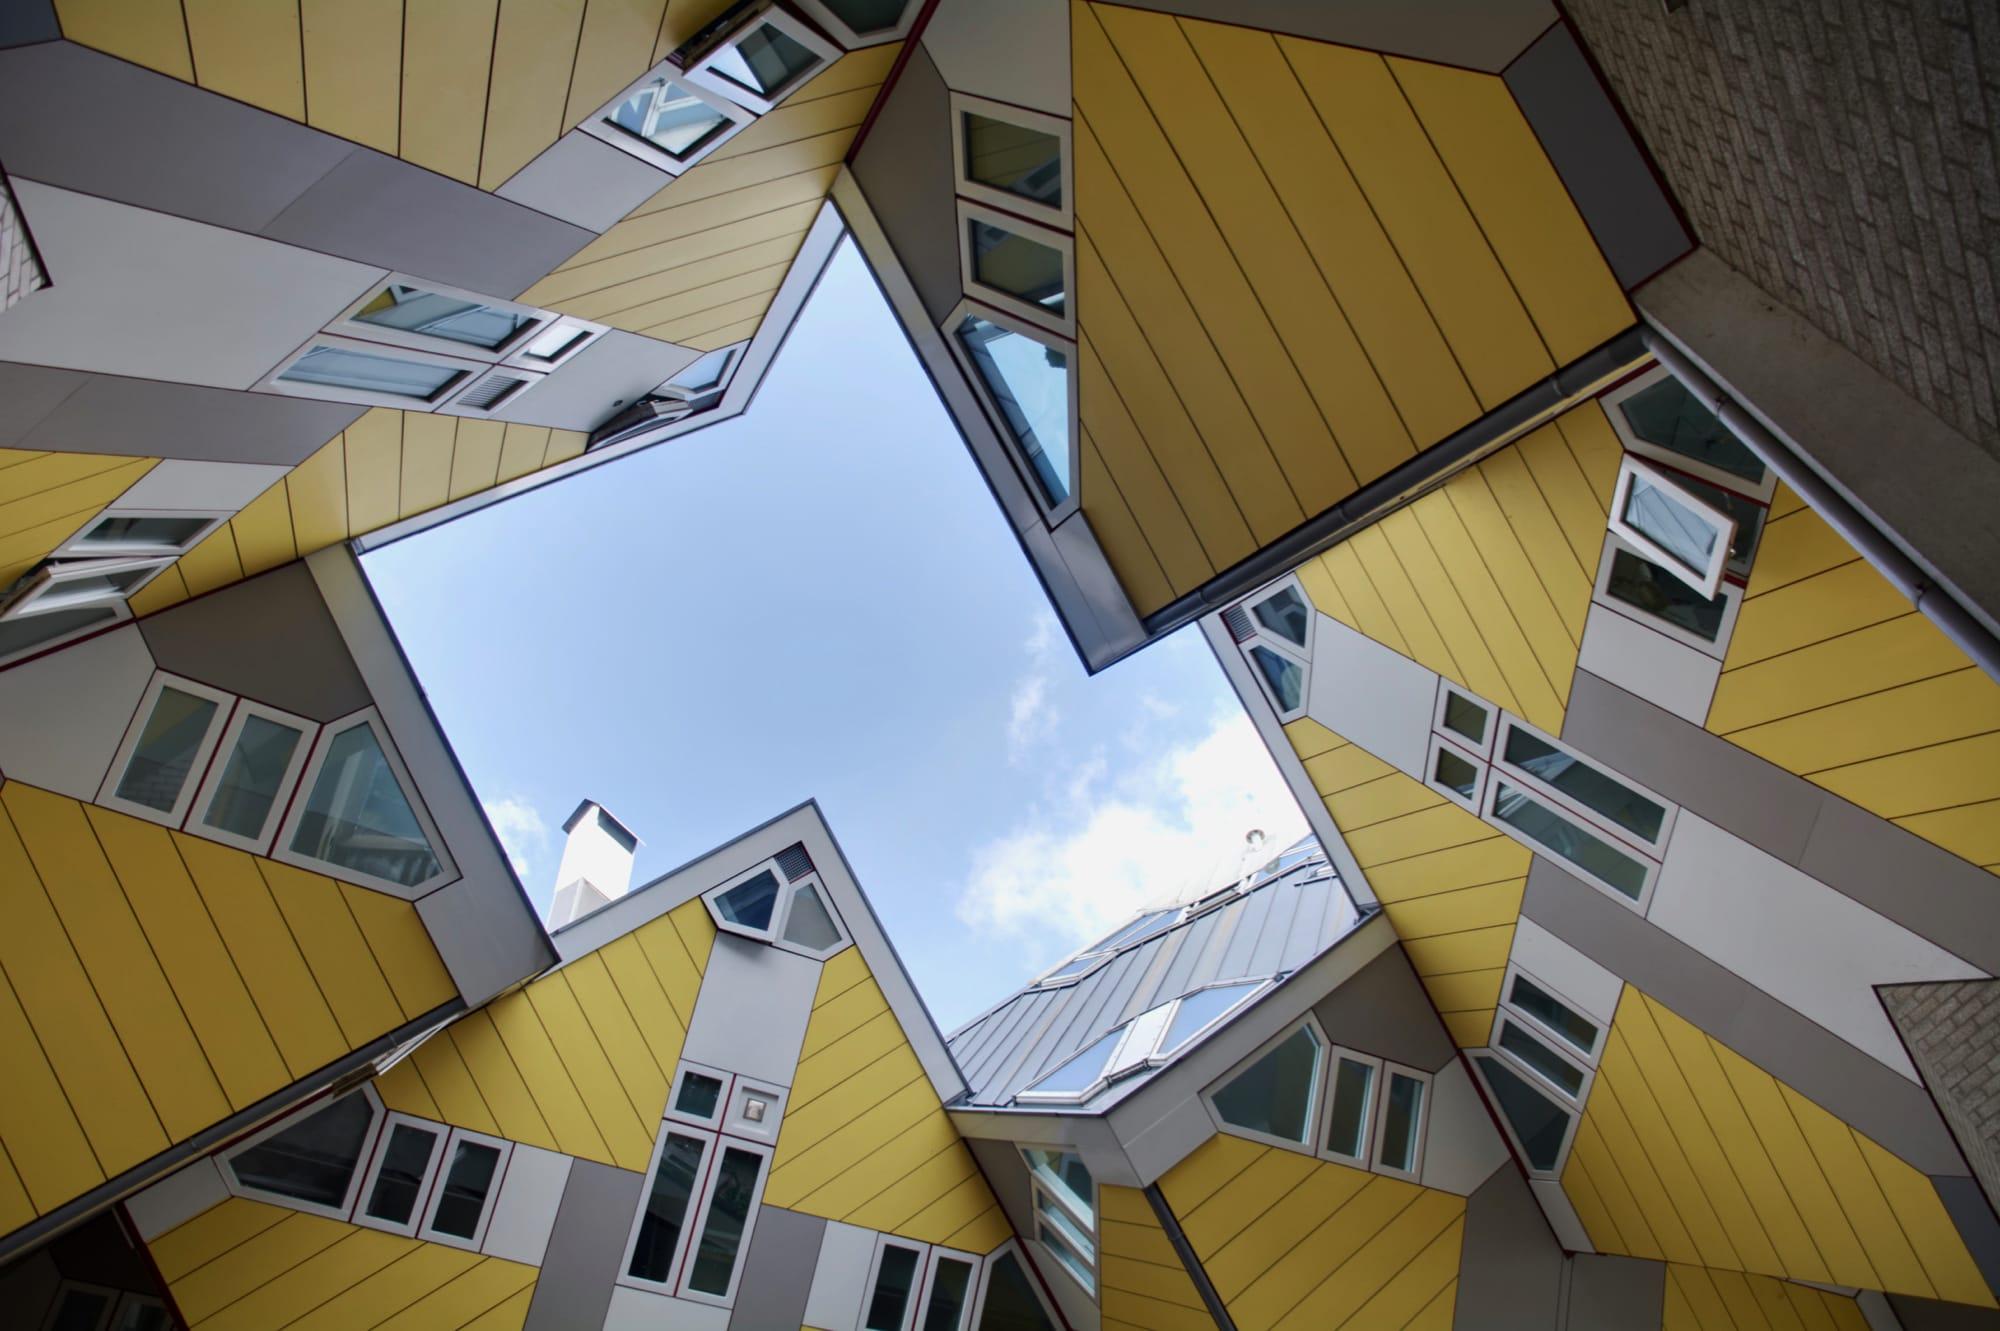 Rotterdam e kinderdijk l 39 architettura moderna e i for Architettura moderna case